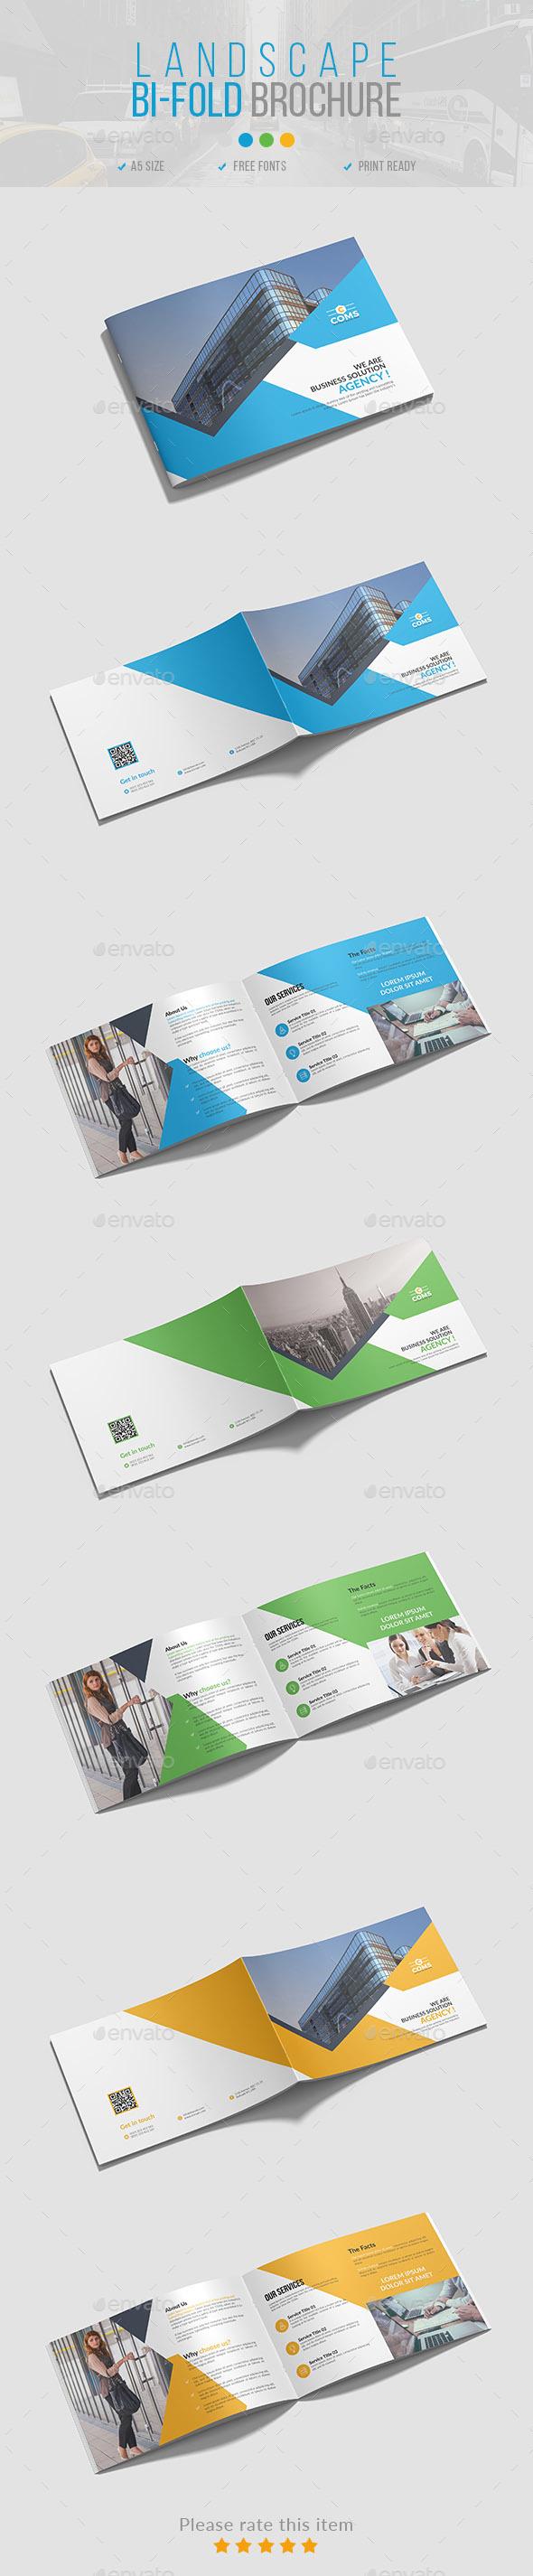 Landscape Bi-Fold Brochure 03 - Brochures Print Templates